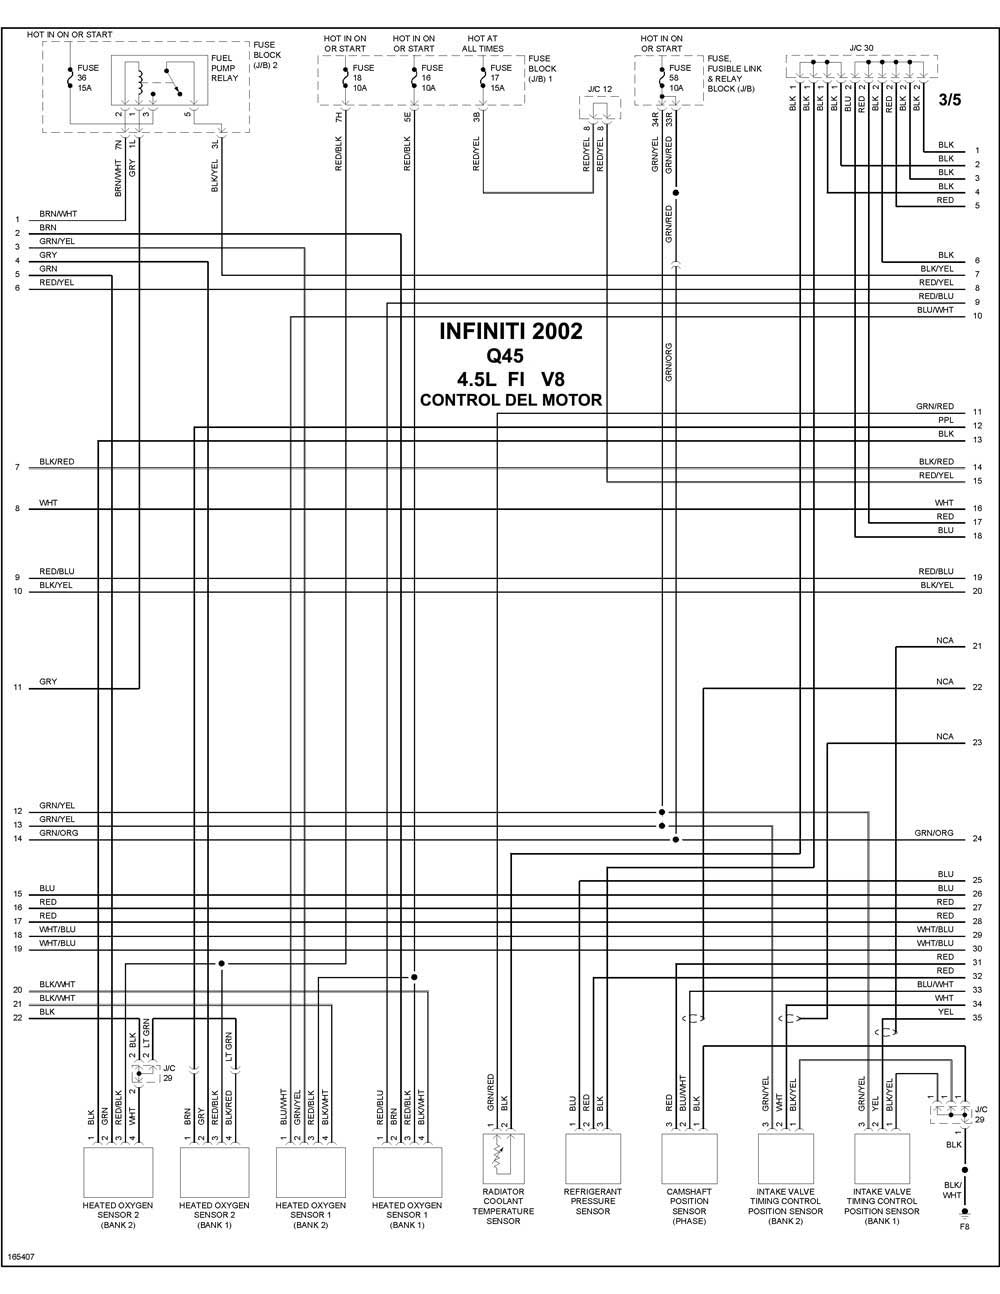 infiniti - diagramas control del motor 2002